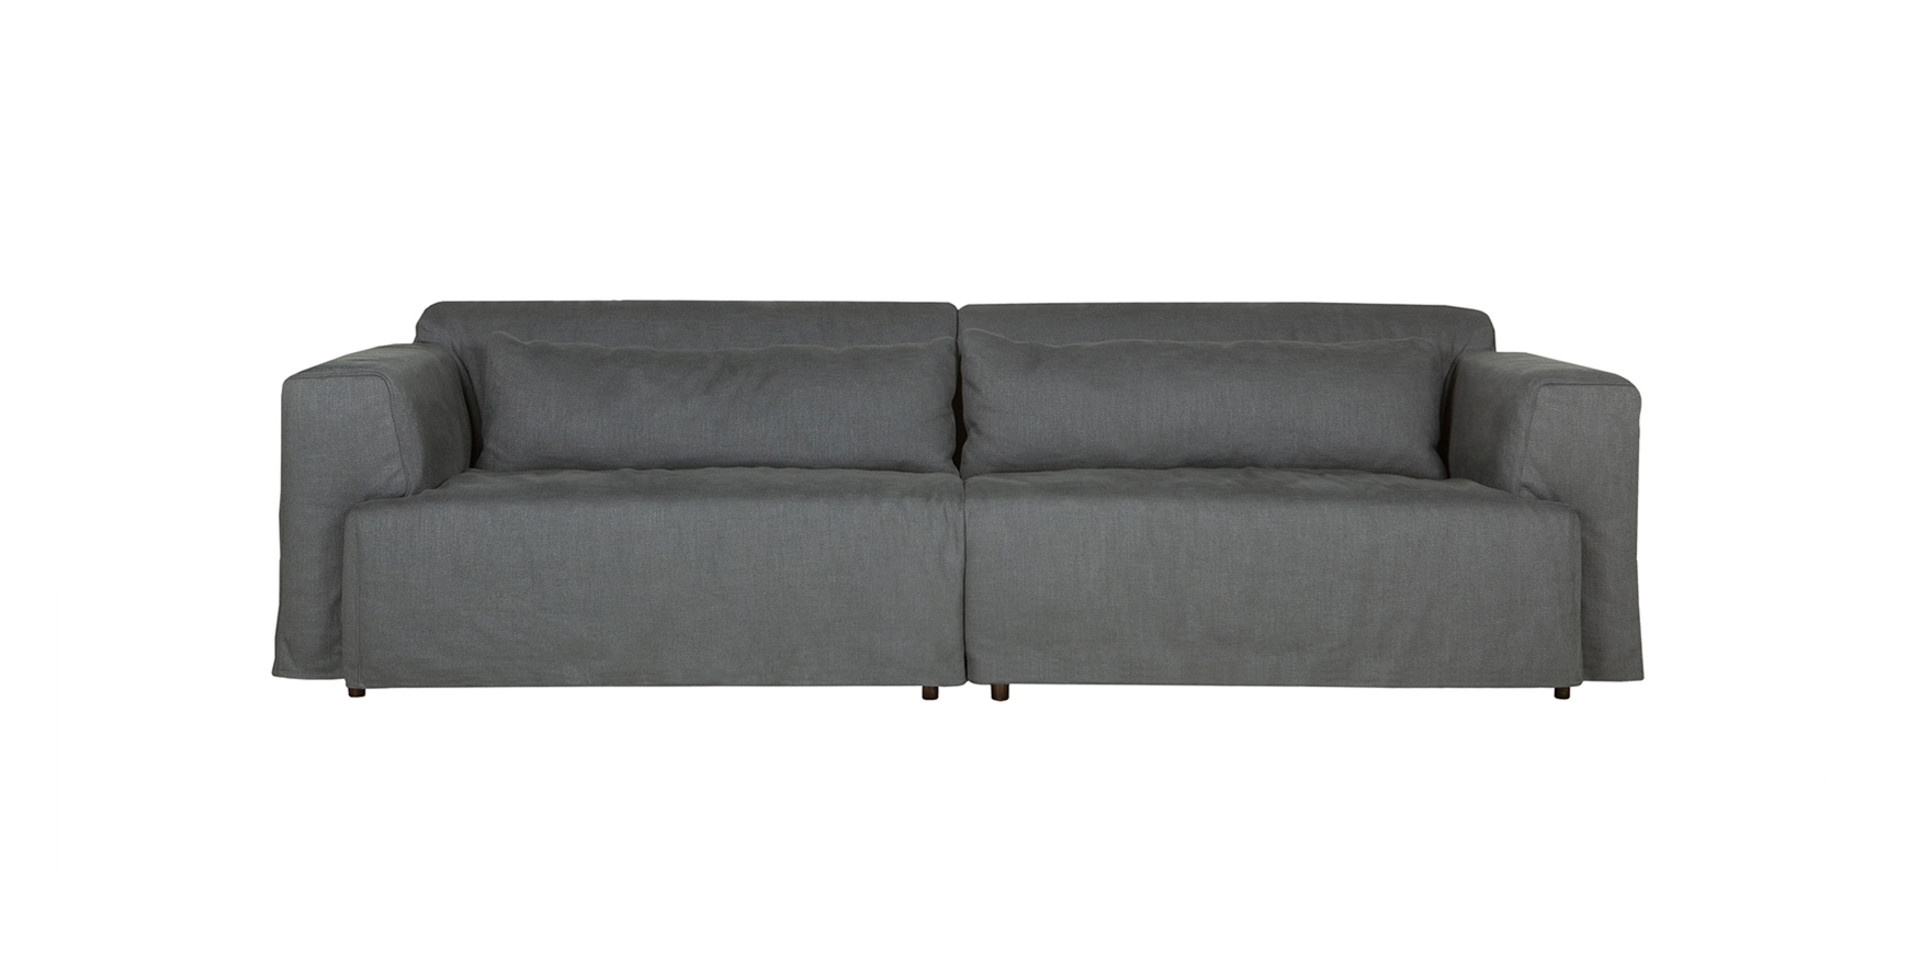 sits-leo-canape-4seater_sobral09_dark_grey_1